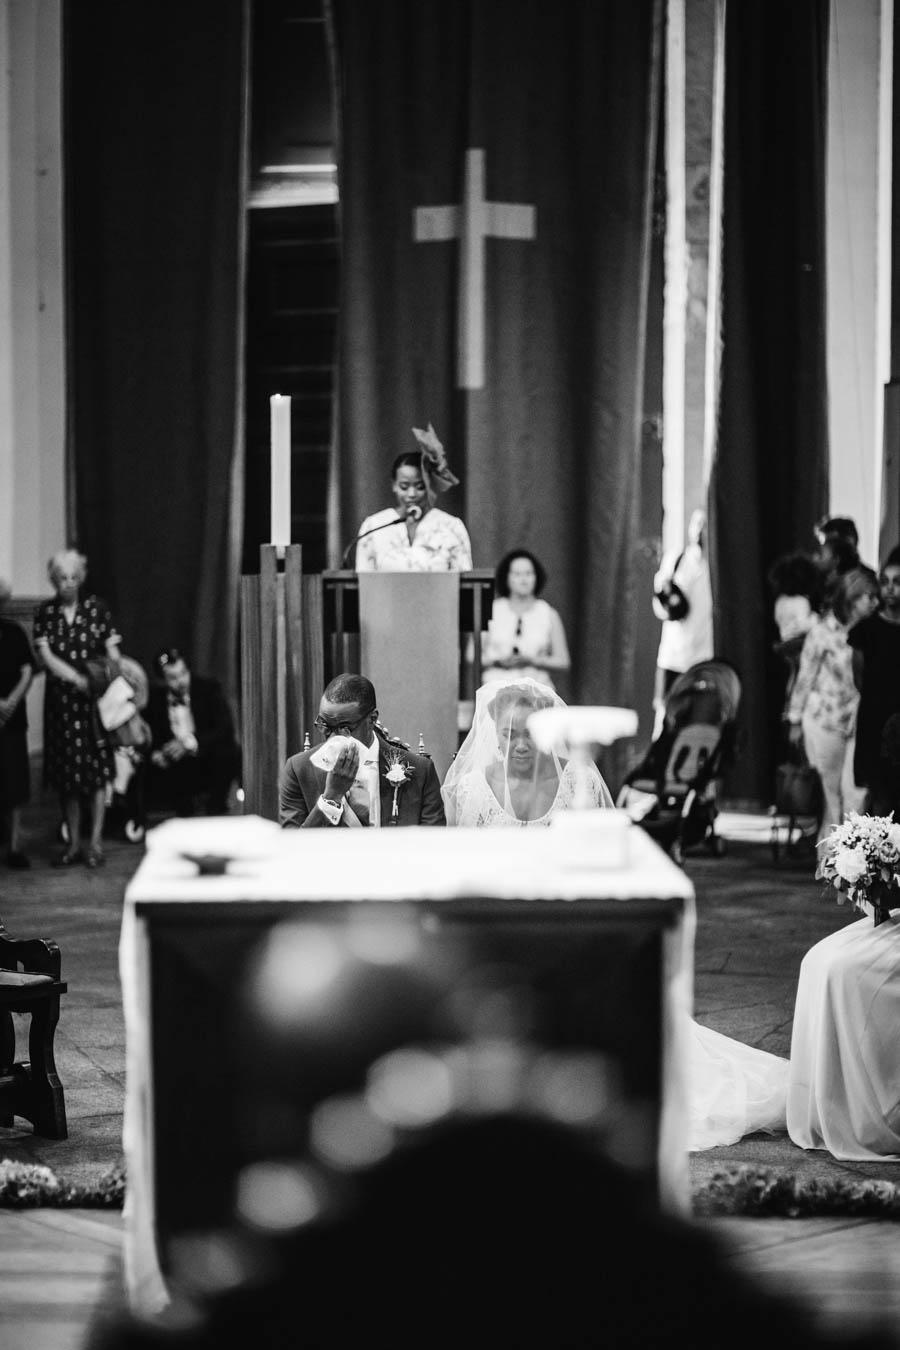 quinta da Torre Bella casamento na igreja da serra do pilar noivo chora durante leitura das escrituras